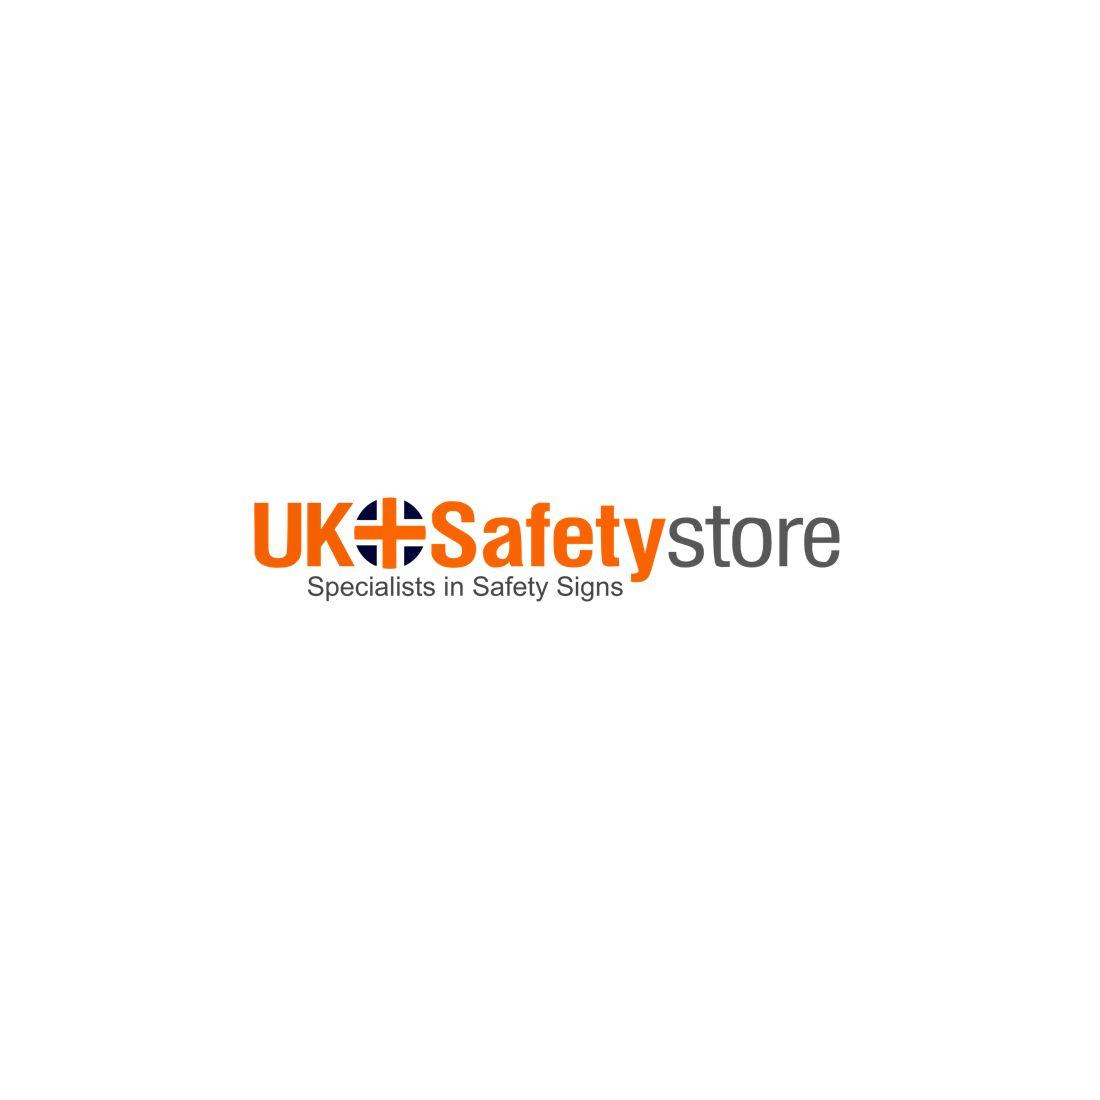 Pack of 24 Protective Footwear Labels 100mm in Diameter